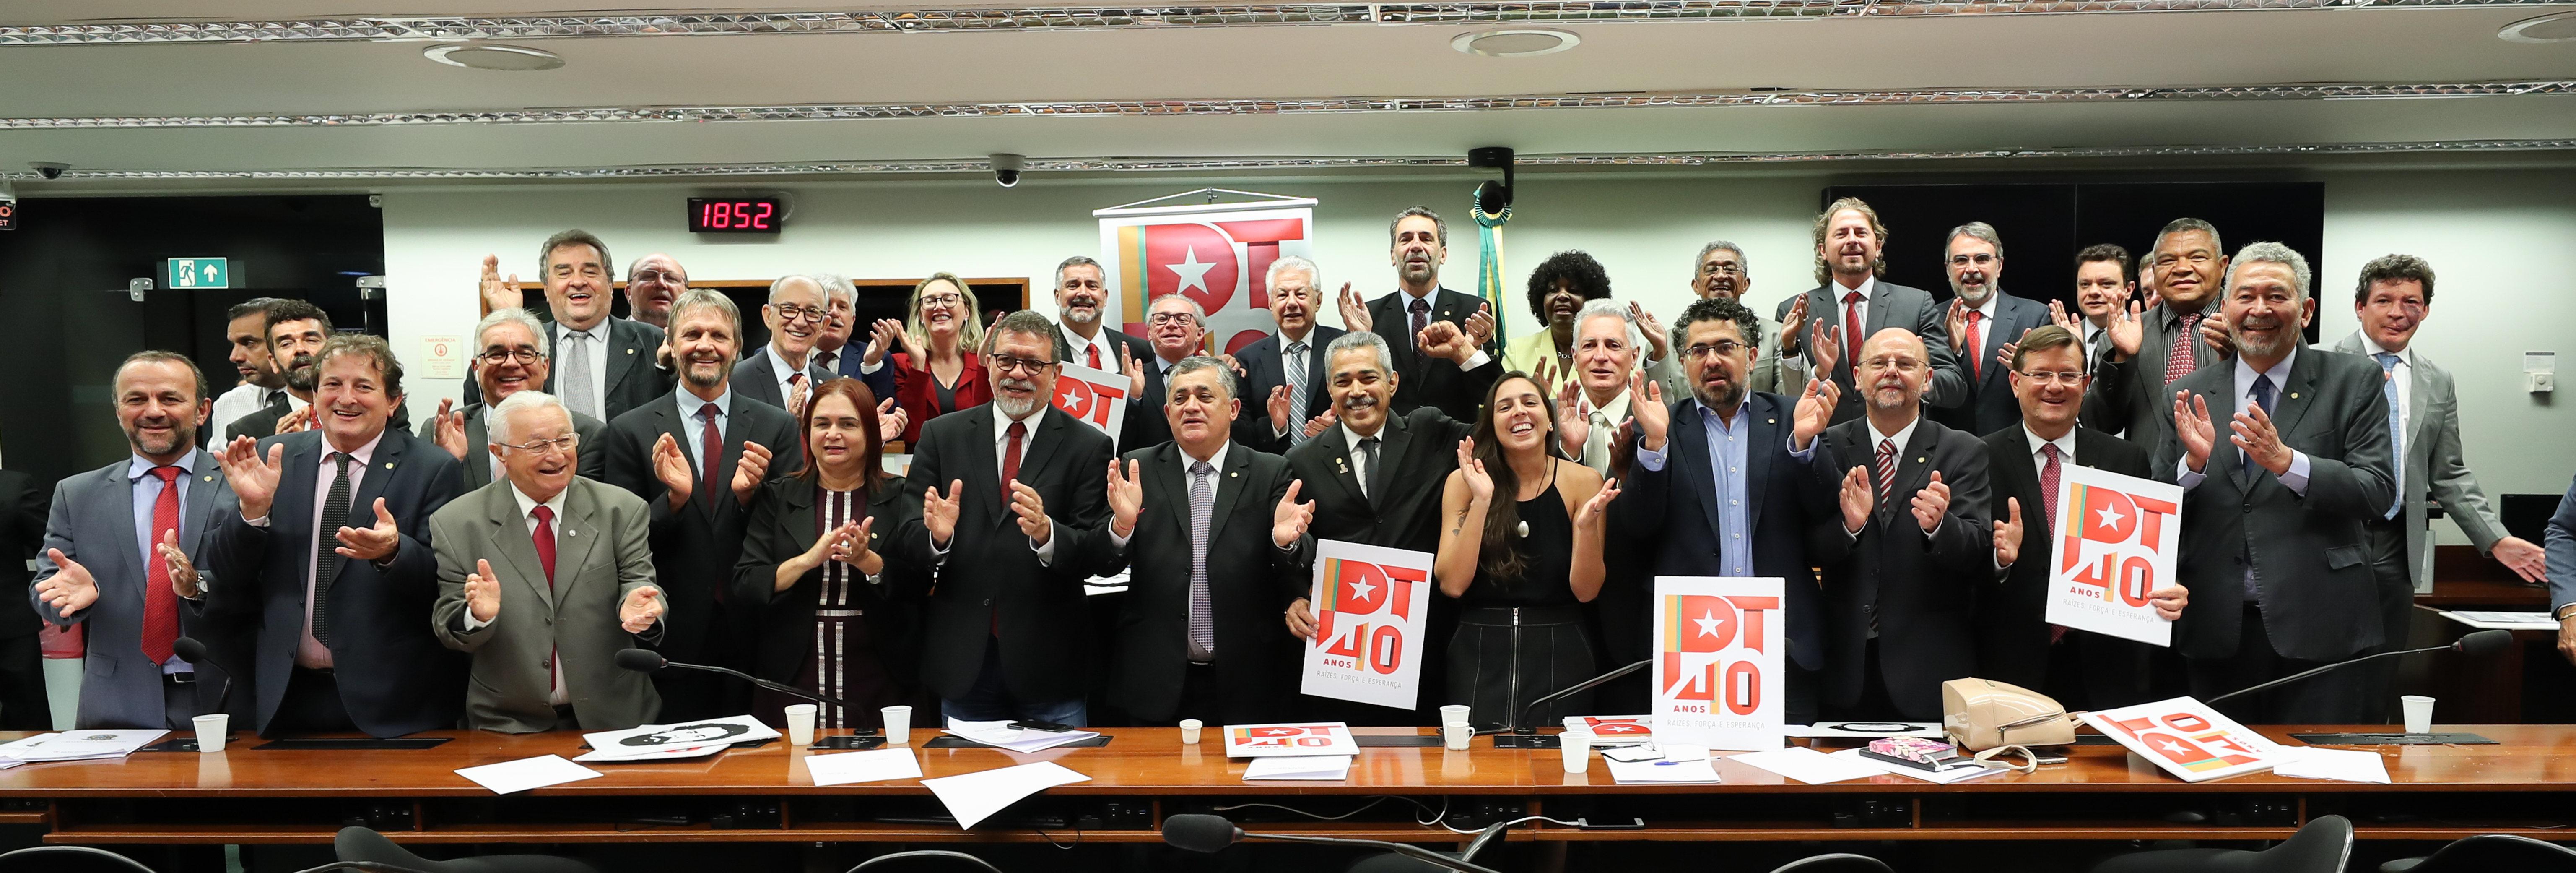 Reunião-bancada-PT-Foto -Lula-Marques-52